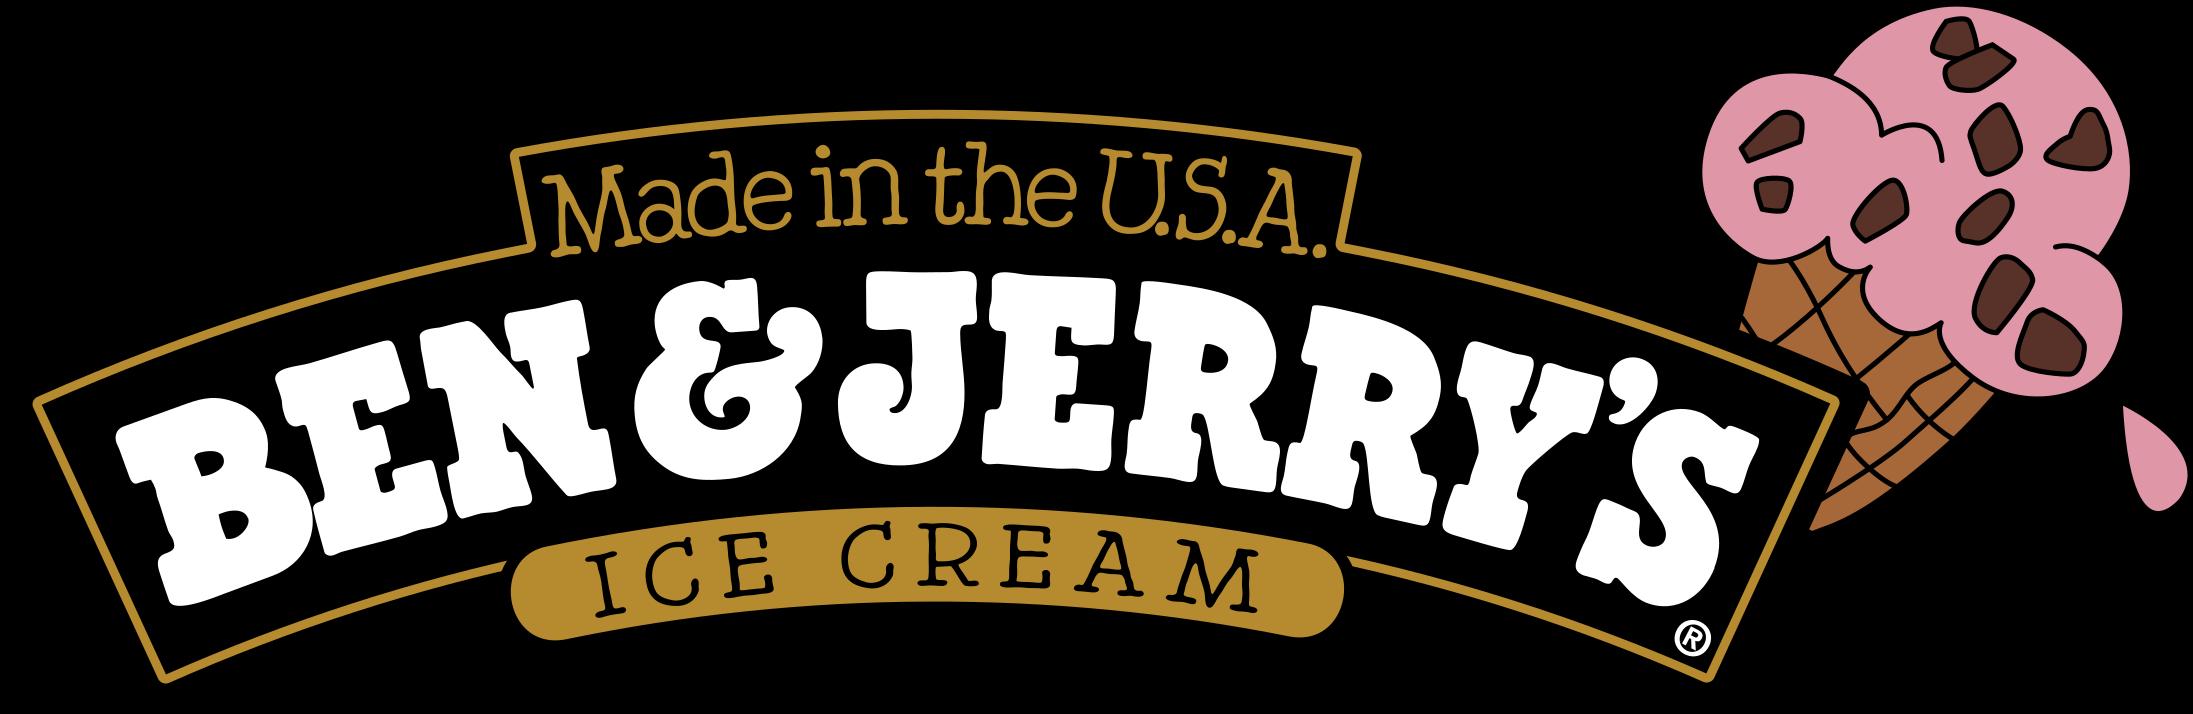 Download Ben & Jerry's Logo Png Transparent.